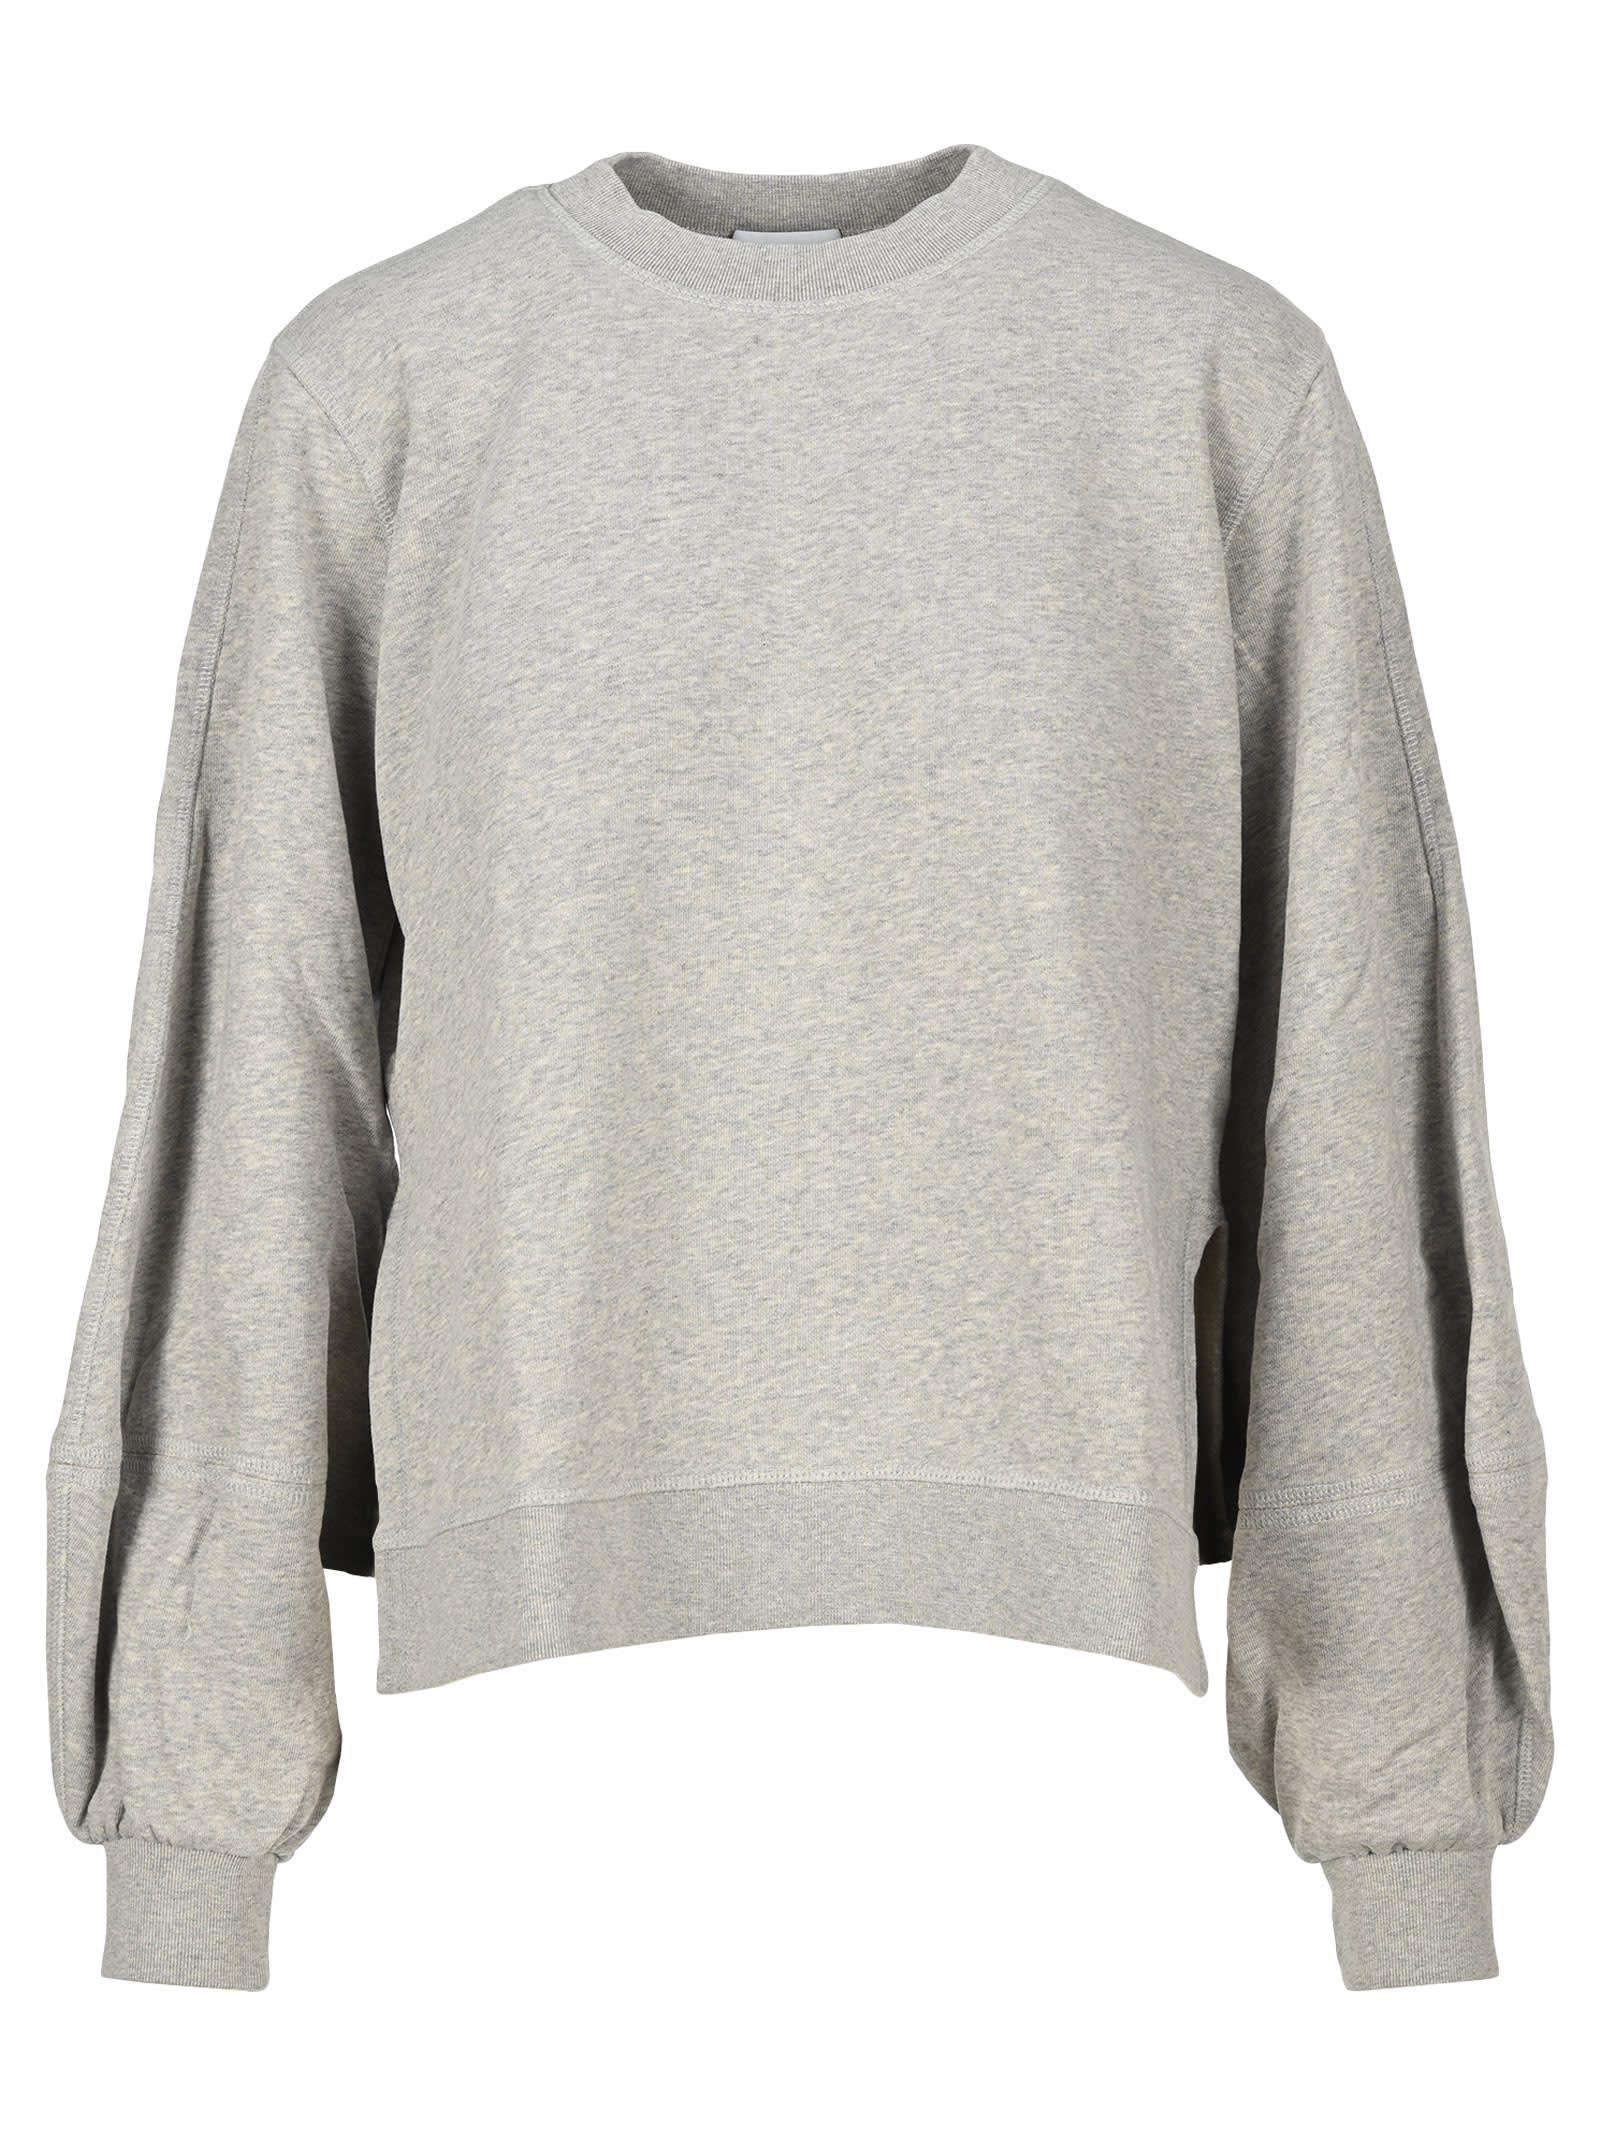 Ganni Isoli Sweatshirt Ganni Cloth Sweatshirts Top Outfits Ganni [ 2136 x 1600 Pixel ]